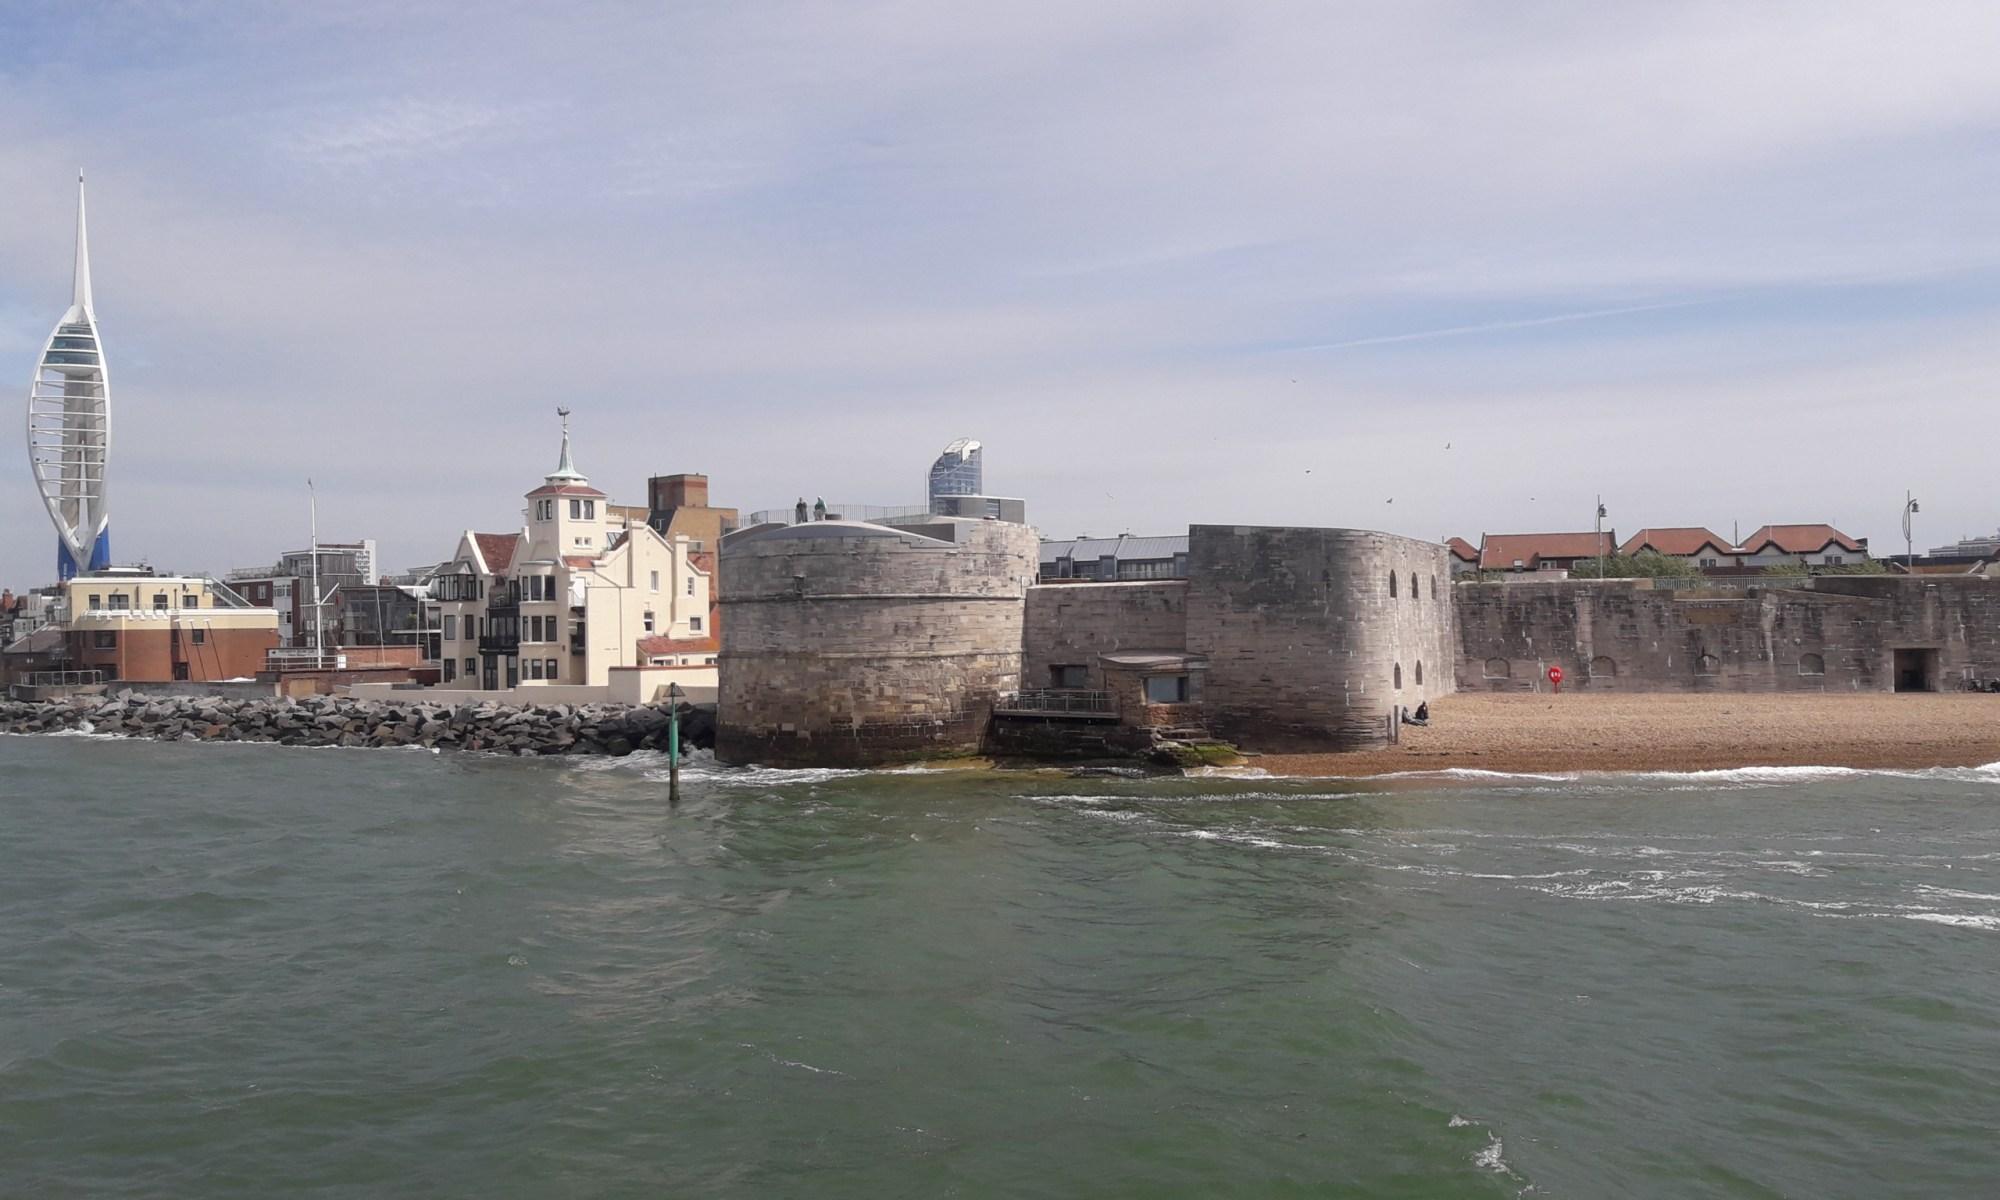 Portsmouth harbour entrance